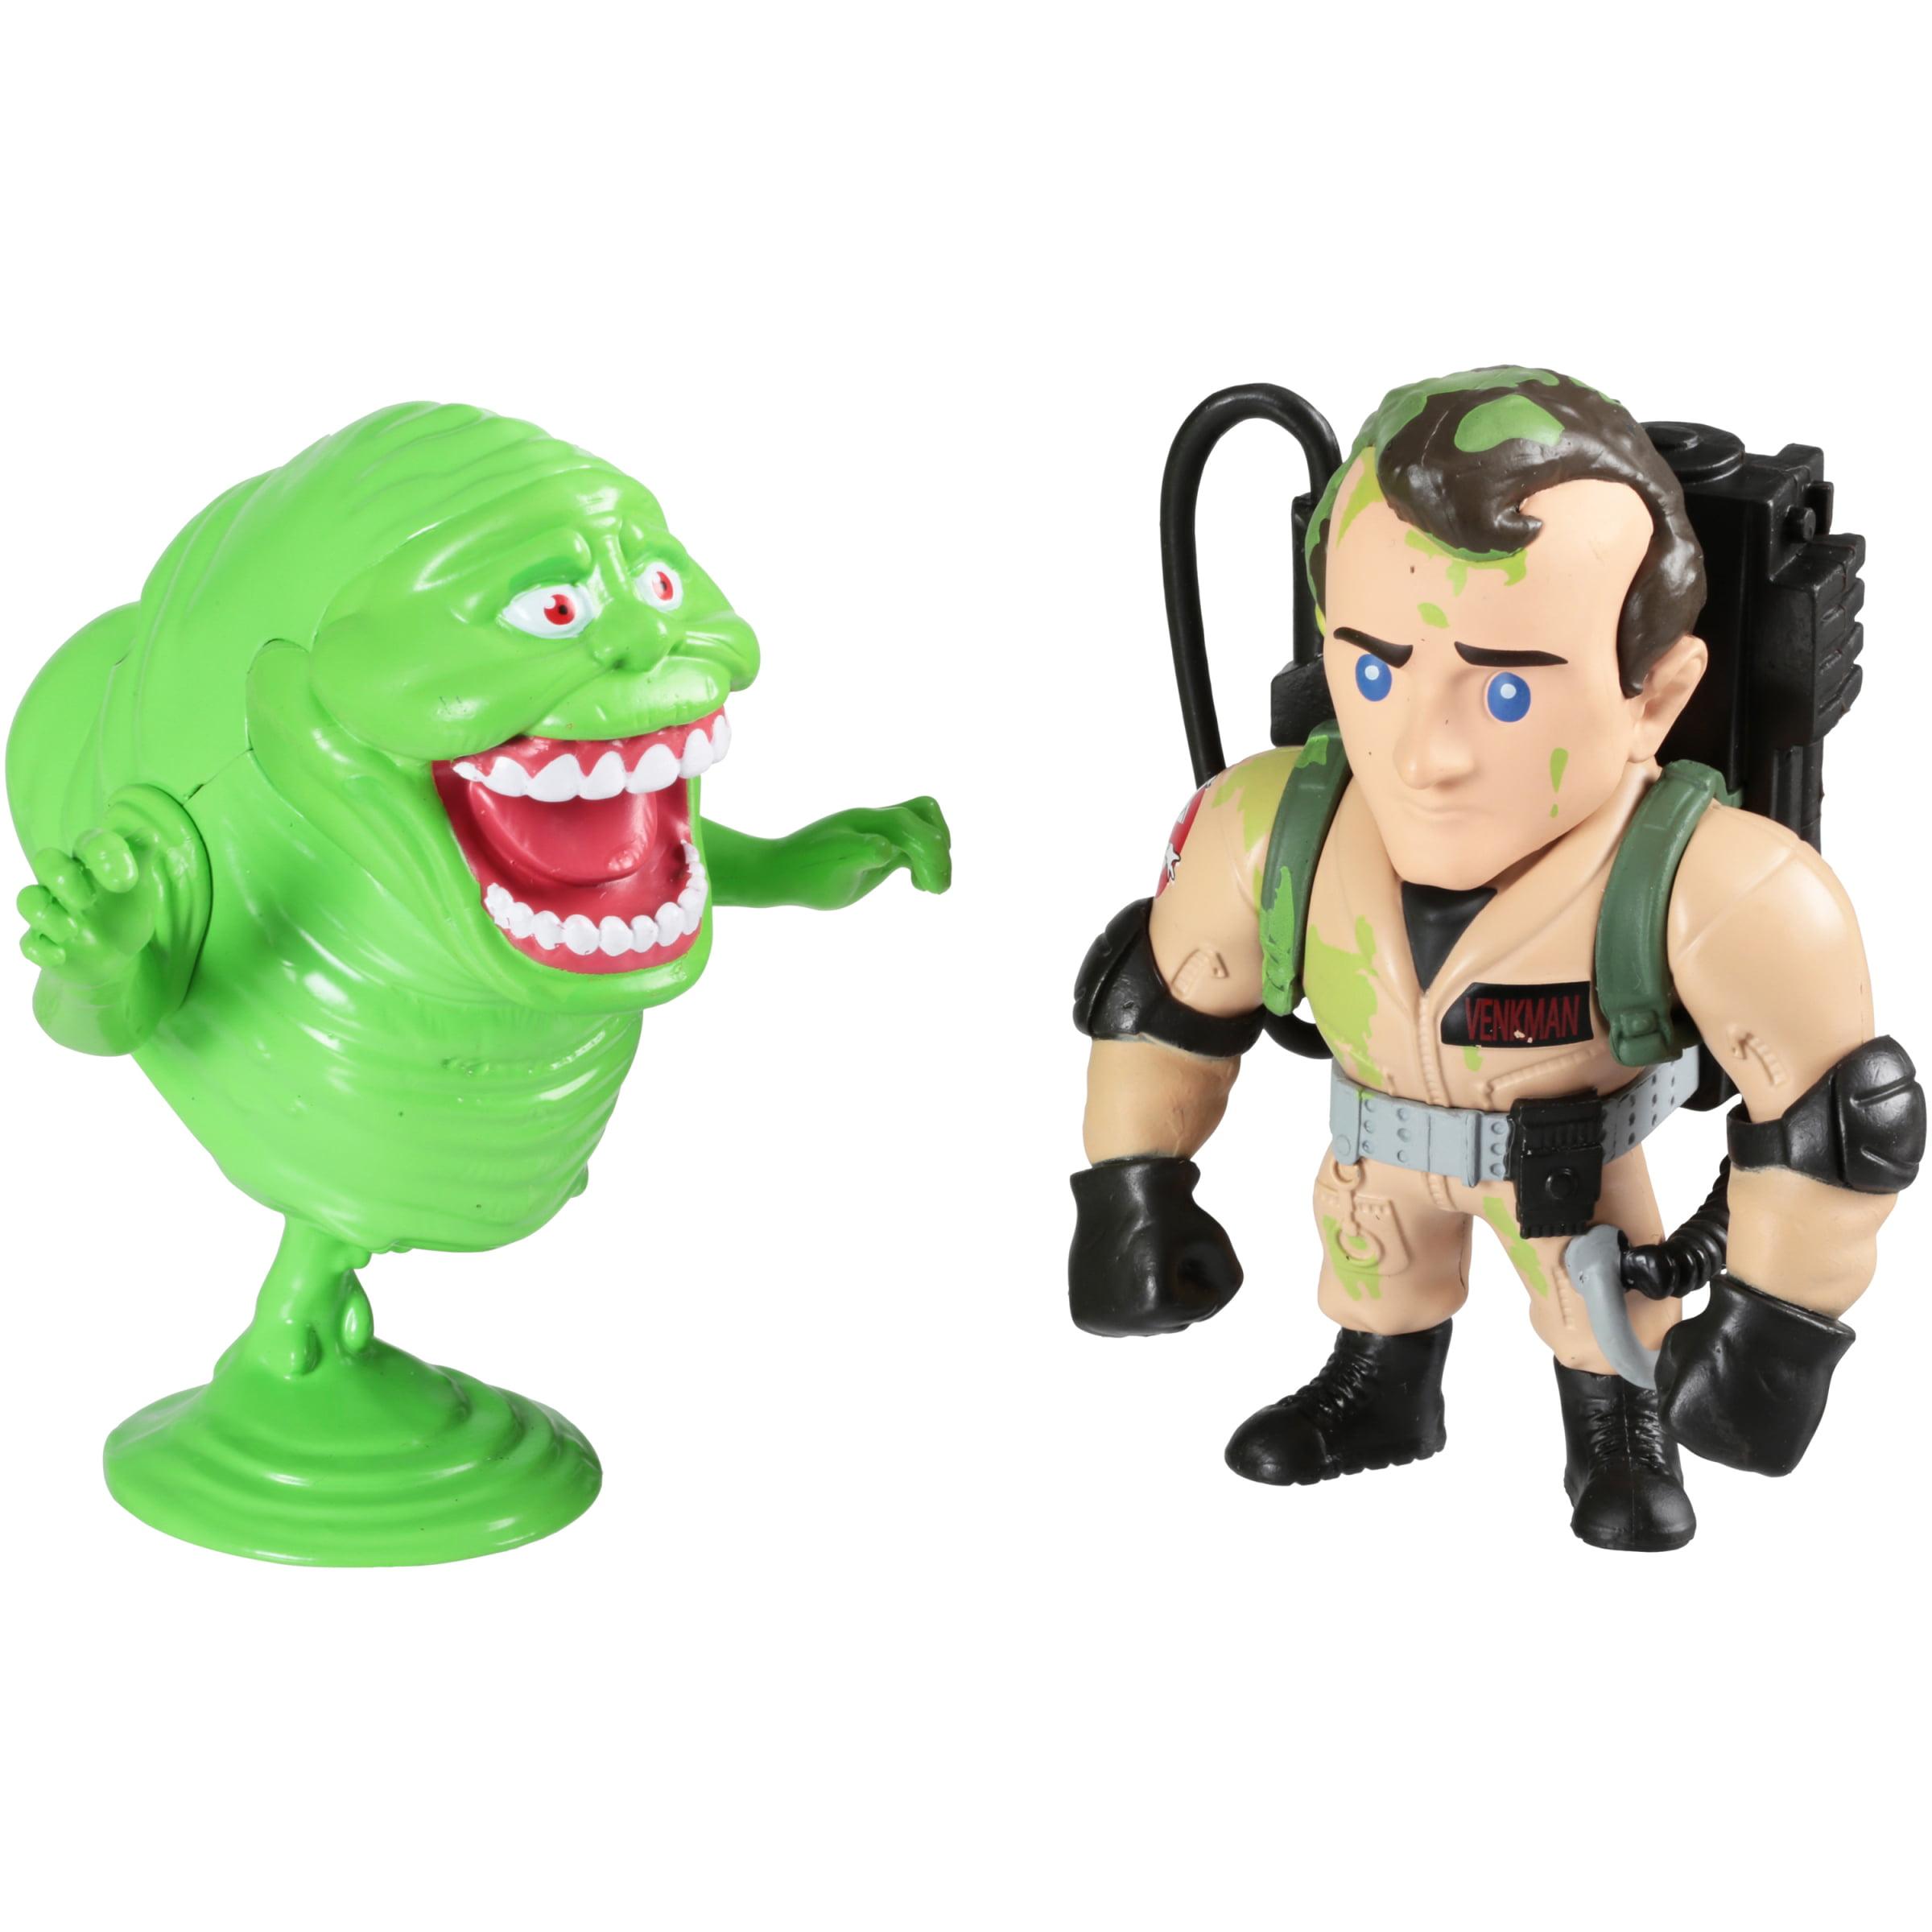 Metals Die Cast Ghostbusters™ Venkman™ & Slimer™ Collectible Figures 2 pc Box